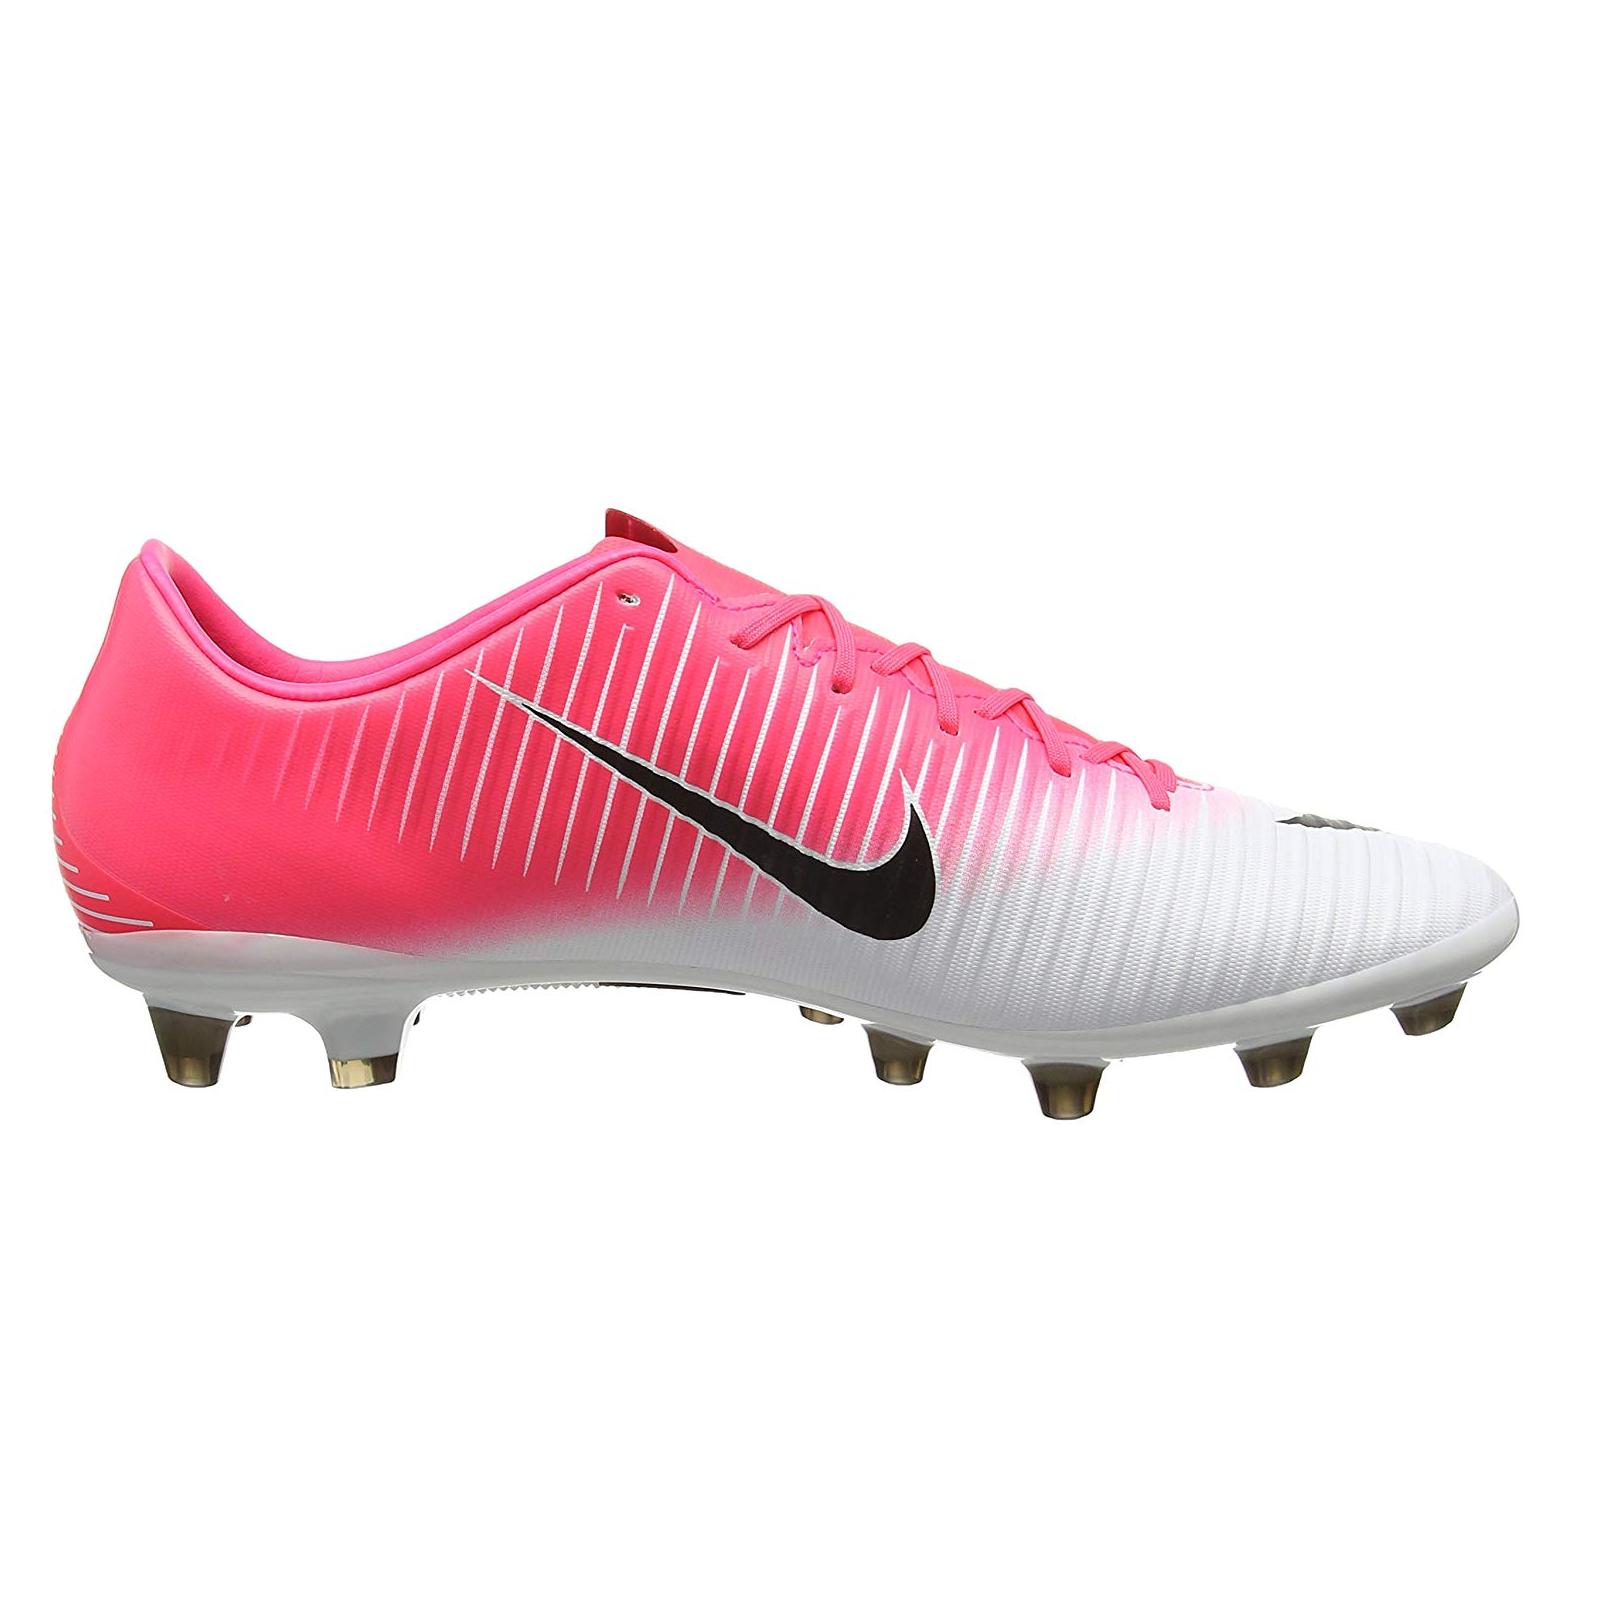 Nike Mercurial Veloce III AG PRO Fußballschuhe pinkweissschwarz 850793 601